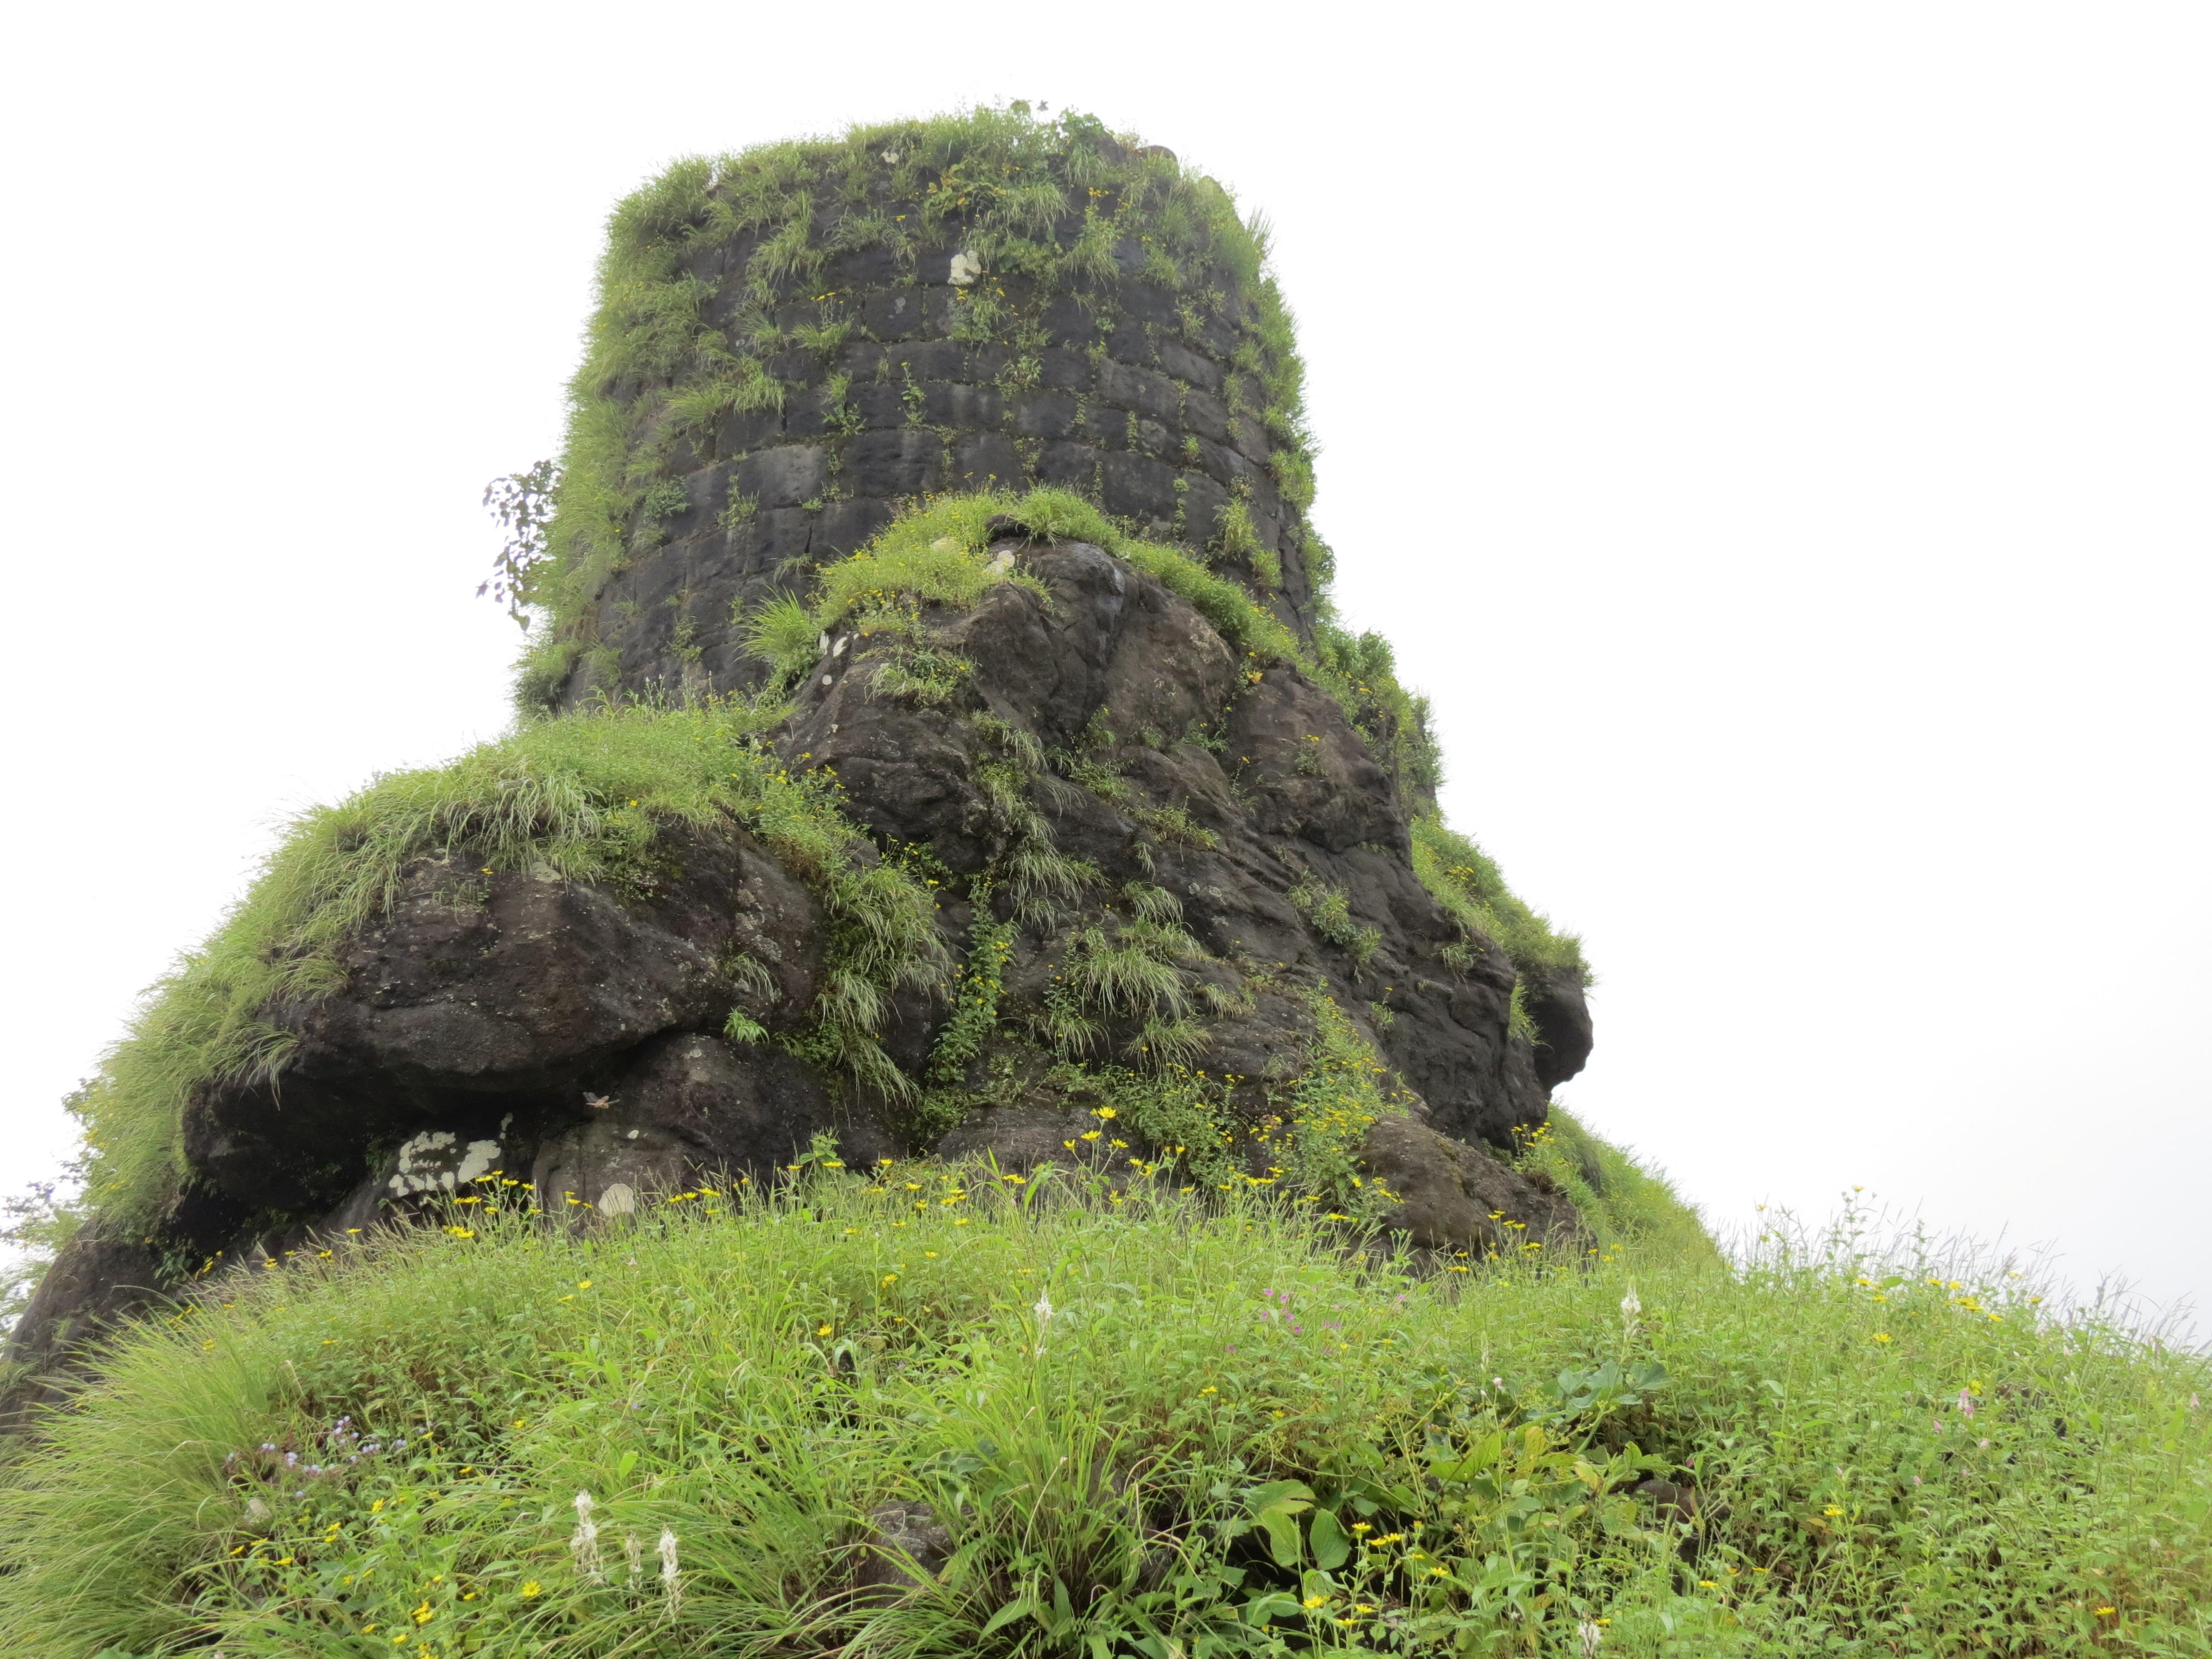 Explore Lonavala: The Jewel Of The Sahyadri Mountains 2